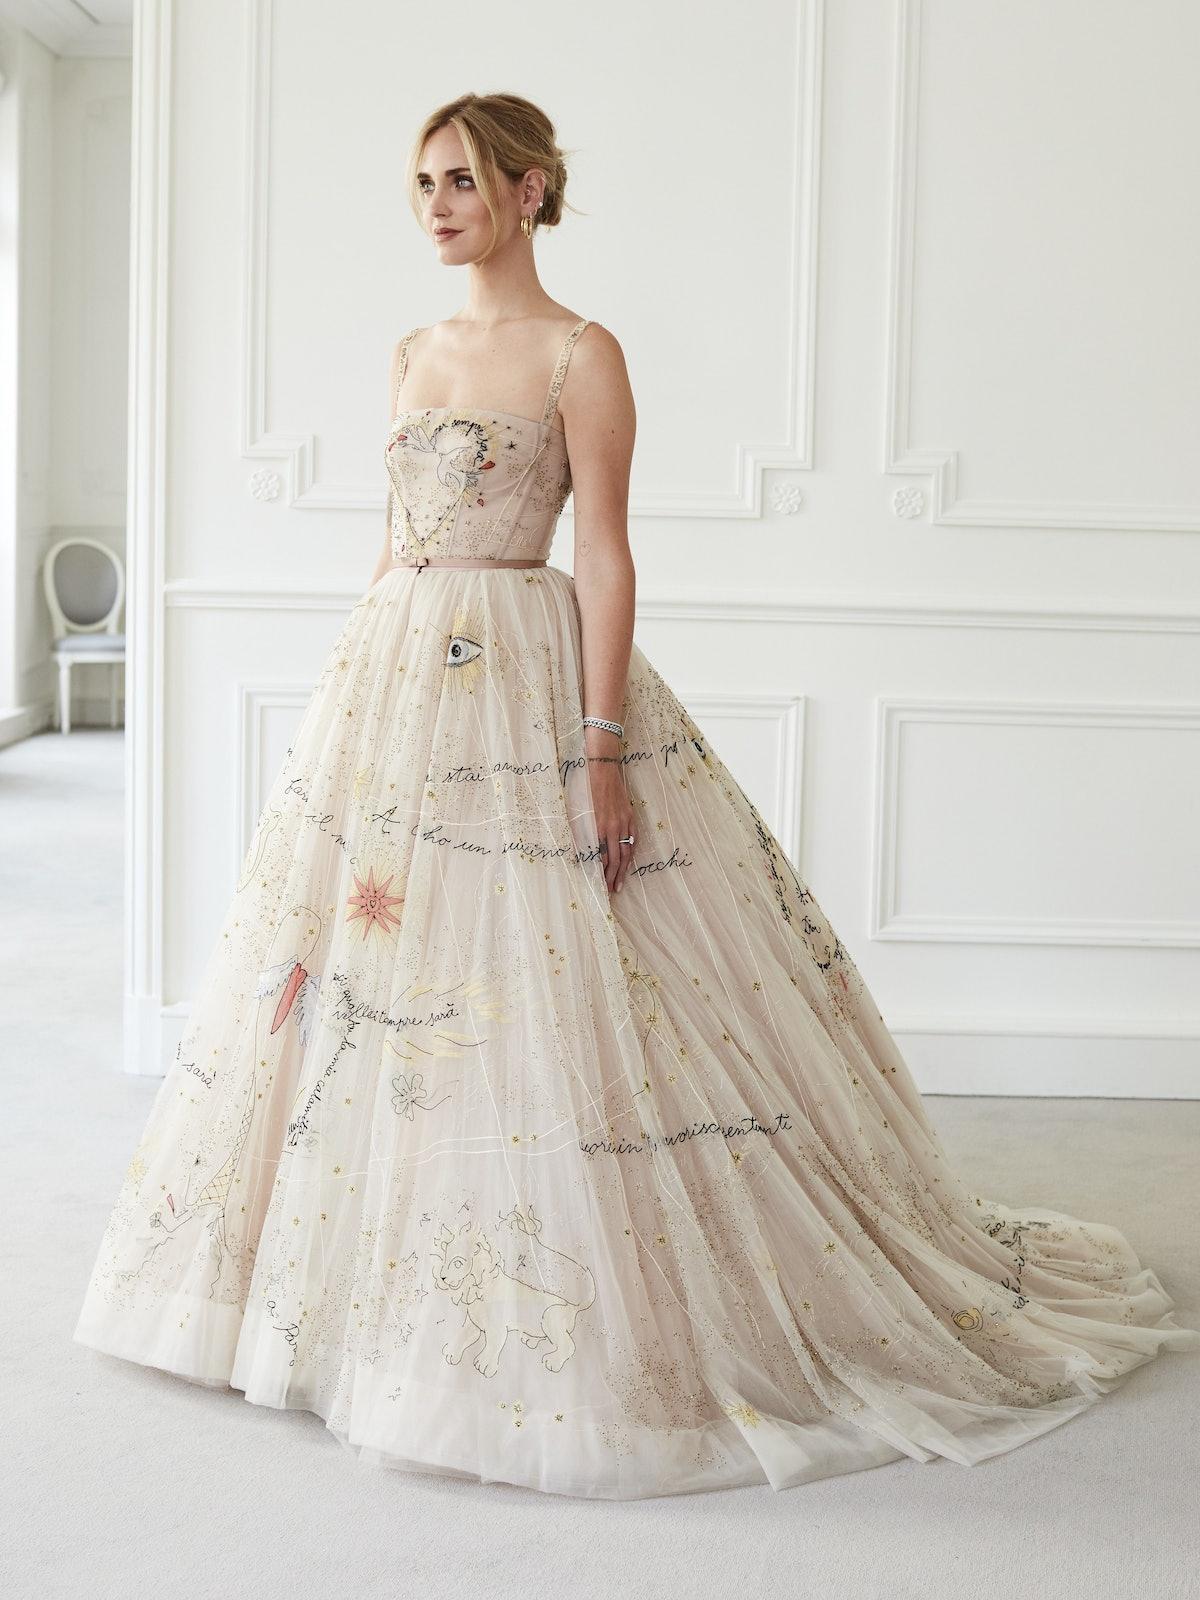 DIOR_CHIARA_FERRAGNI_WEDDING_GRANDS SALONS_© JOHAN SANDBERG_3.jpg